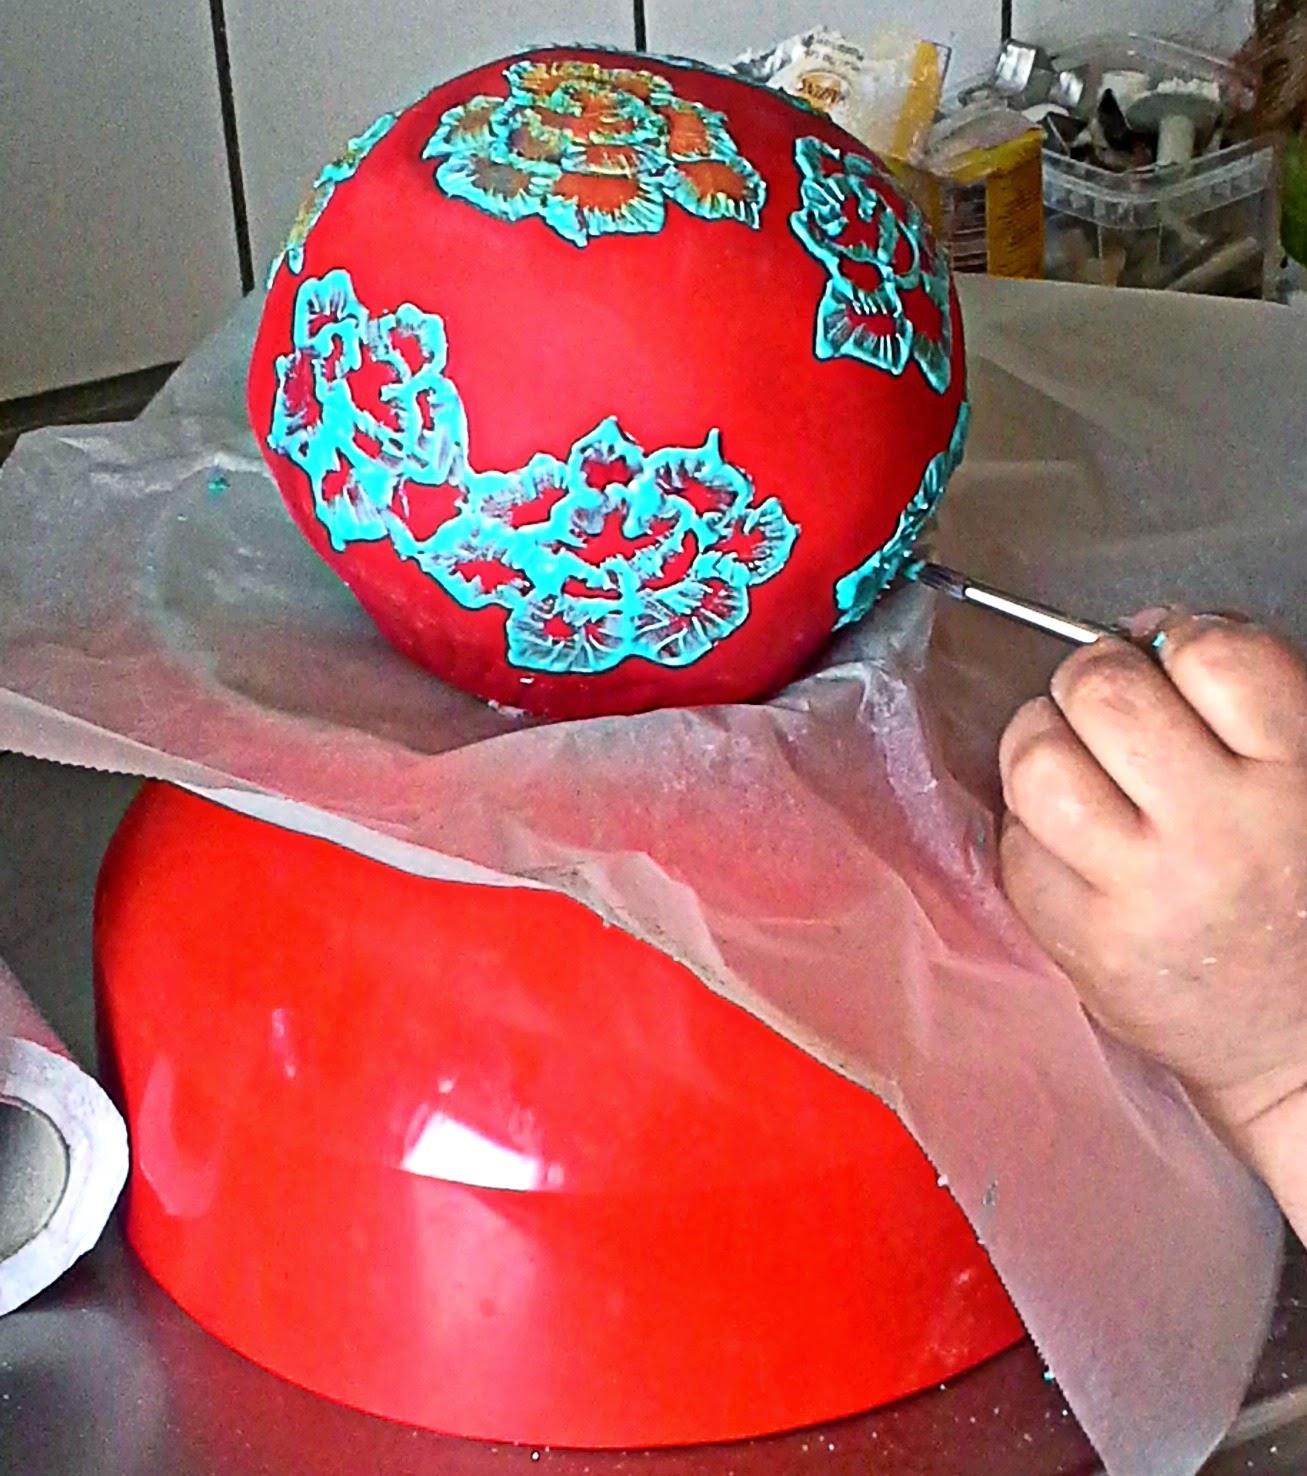 http://cupcakeluvs.blogspot.dk/2014/03/sphere-cake-rund-kage.html